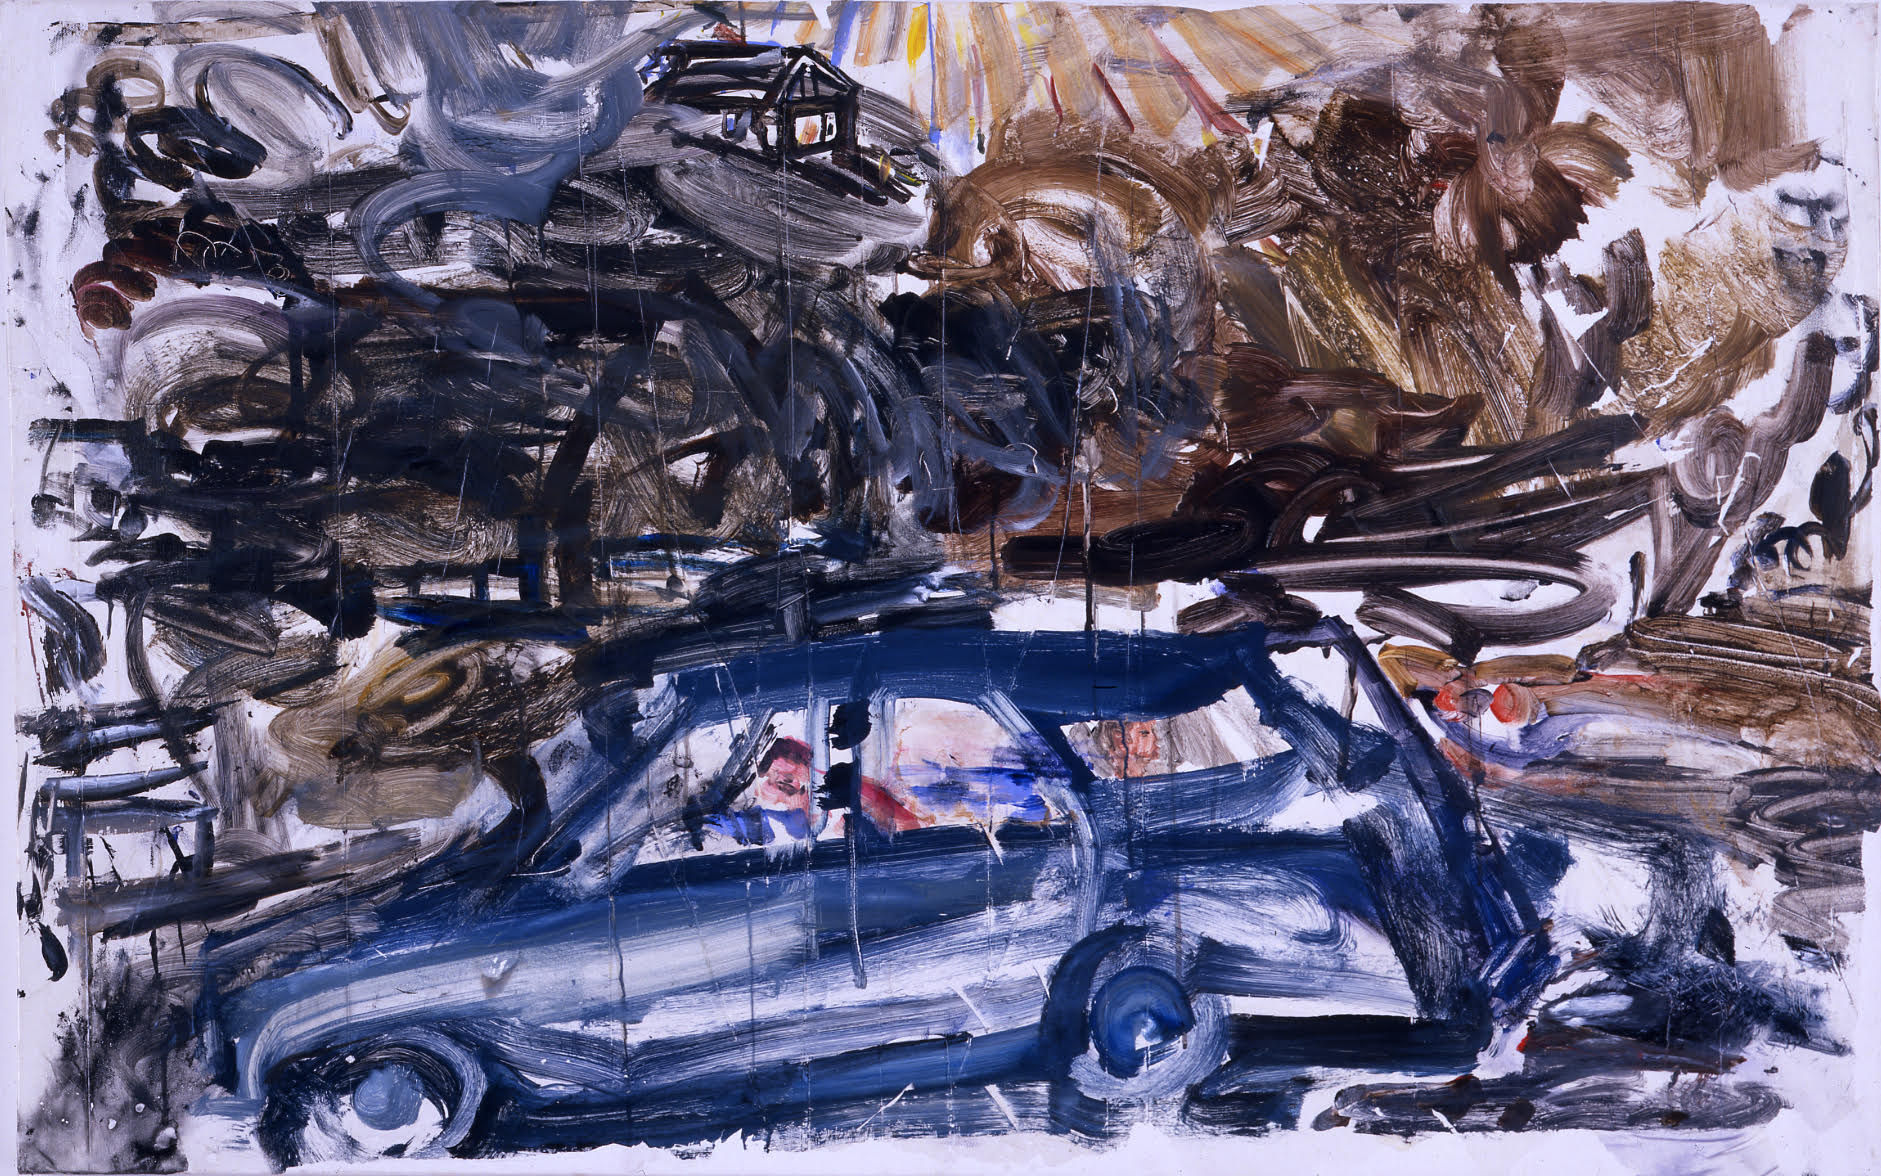 David Deutsch,  Idle , 2009, Acrylic on linen, 30h x 48w in.